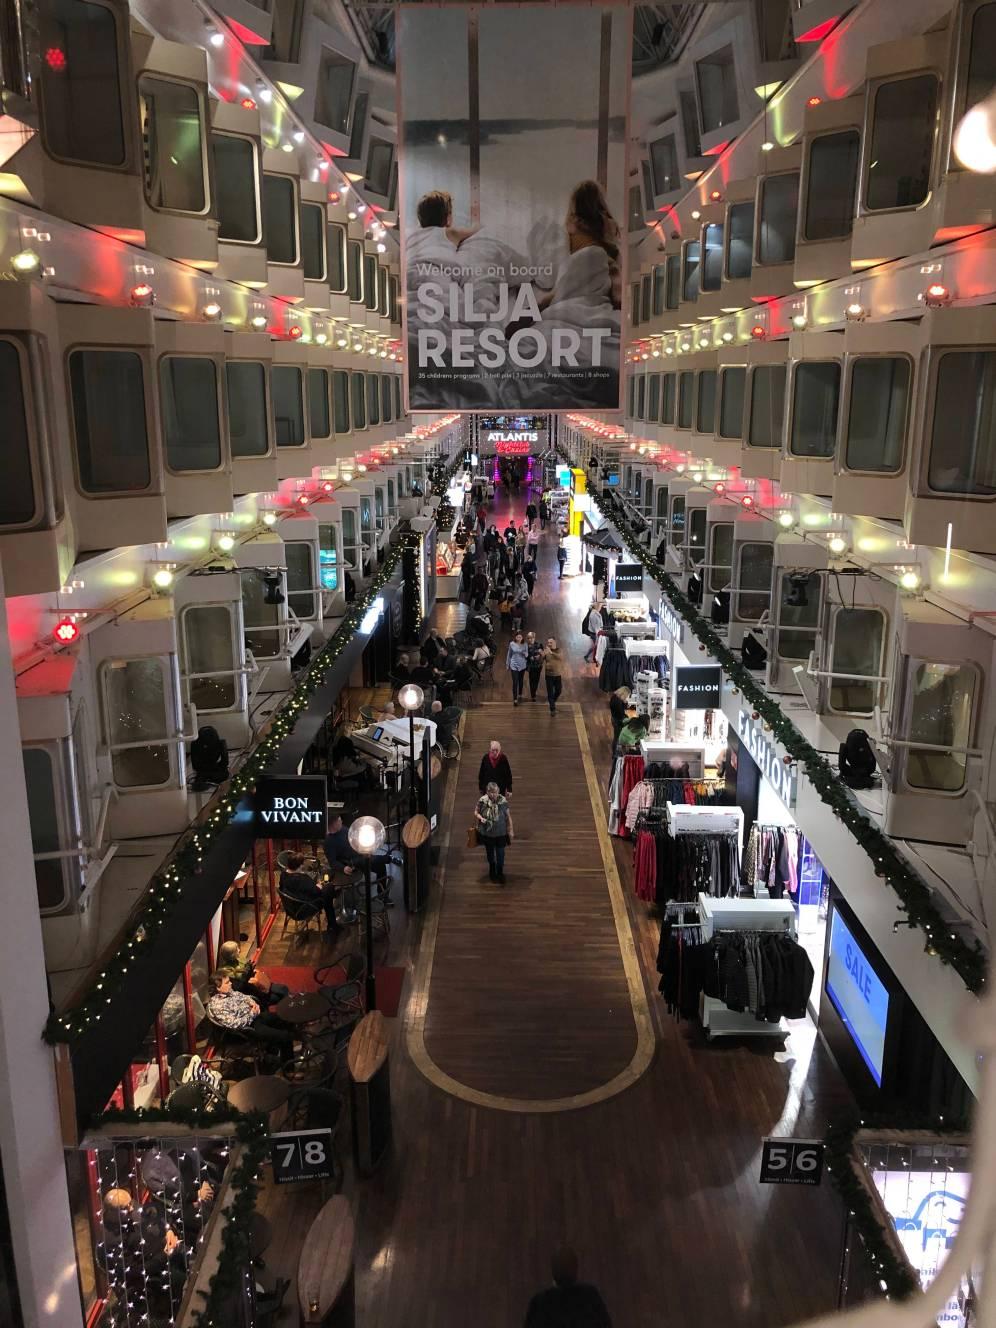 Ferry rasa Mall. Di lantai bawah ada toko-toko, restoran, kafe, sampai casino. Sementara di lantai dua sampai ke atas adalah kabin-kabin penumpang